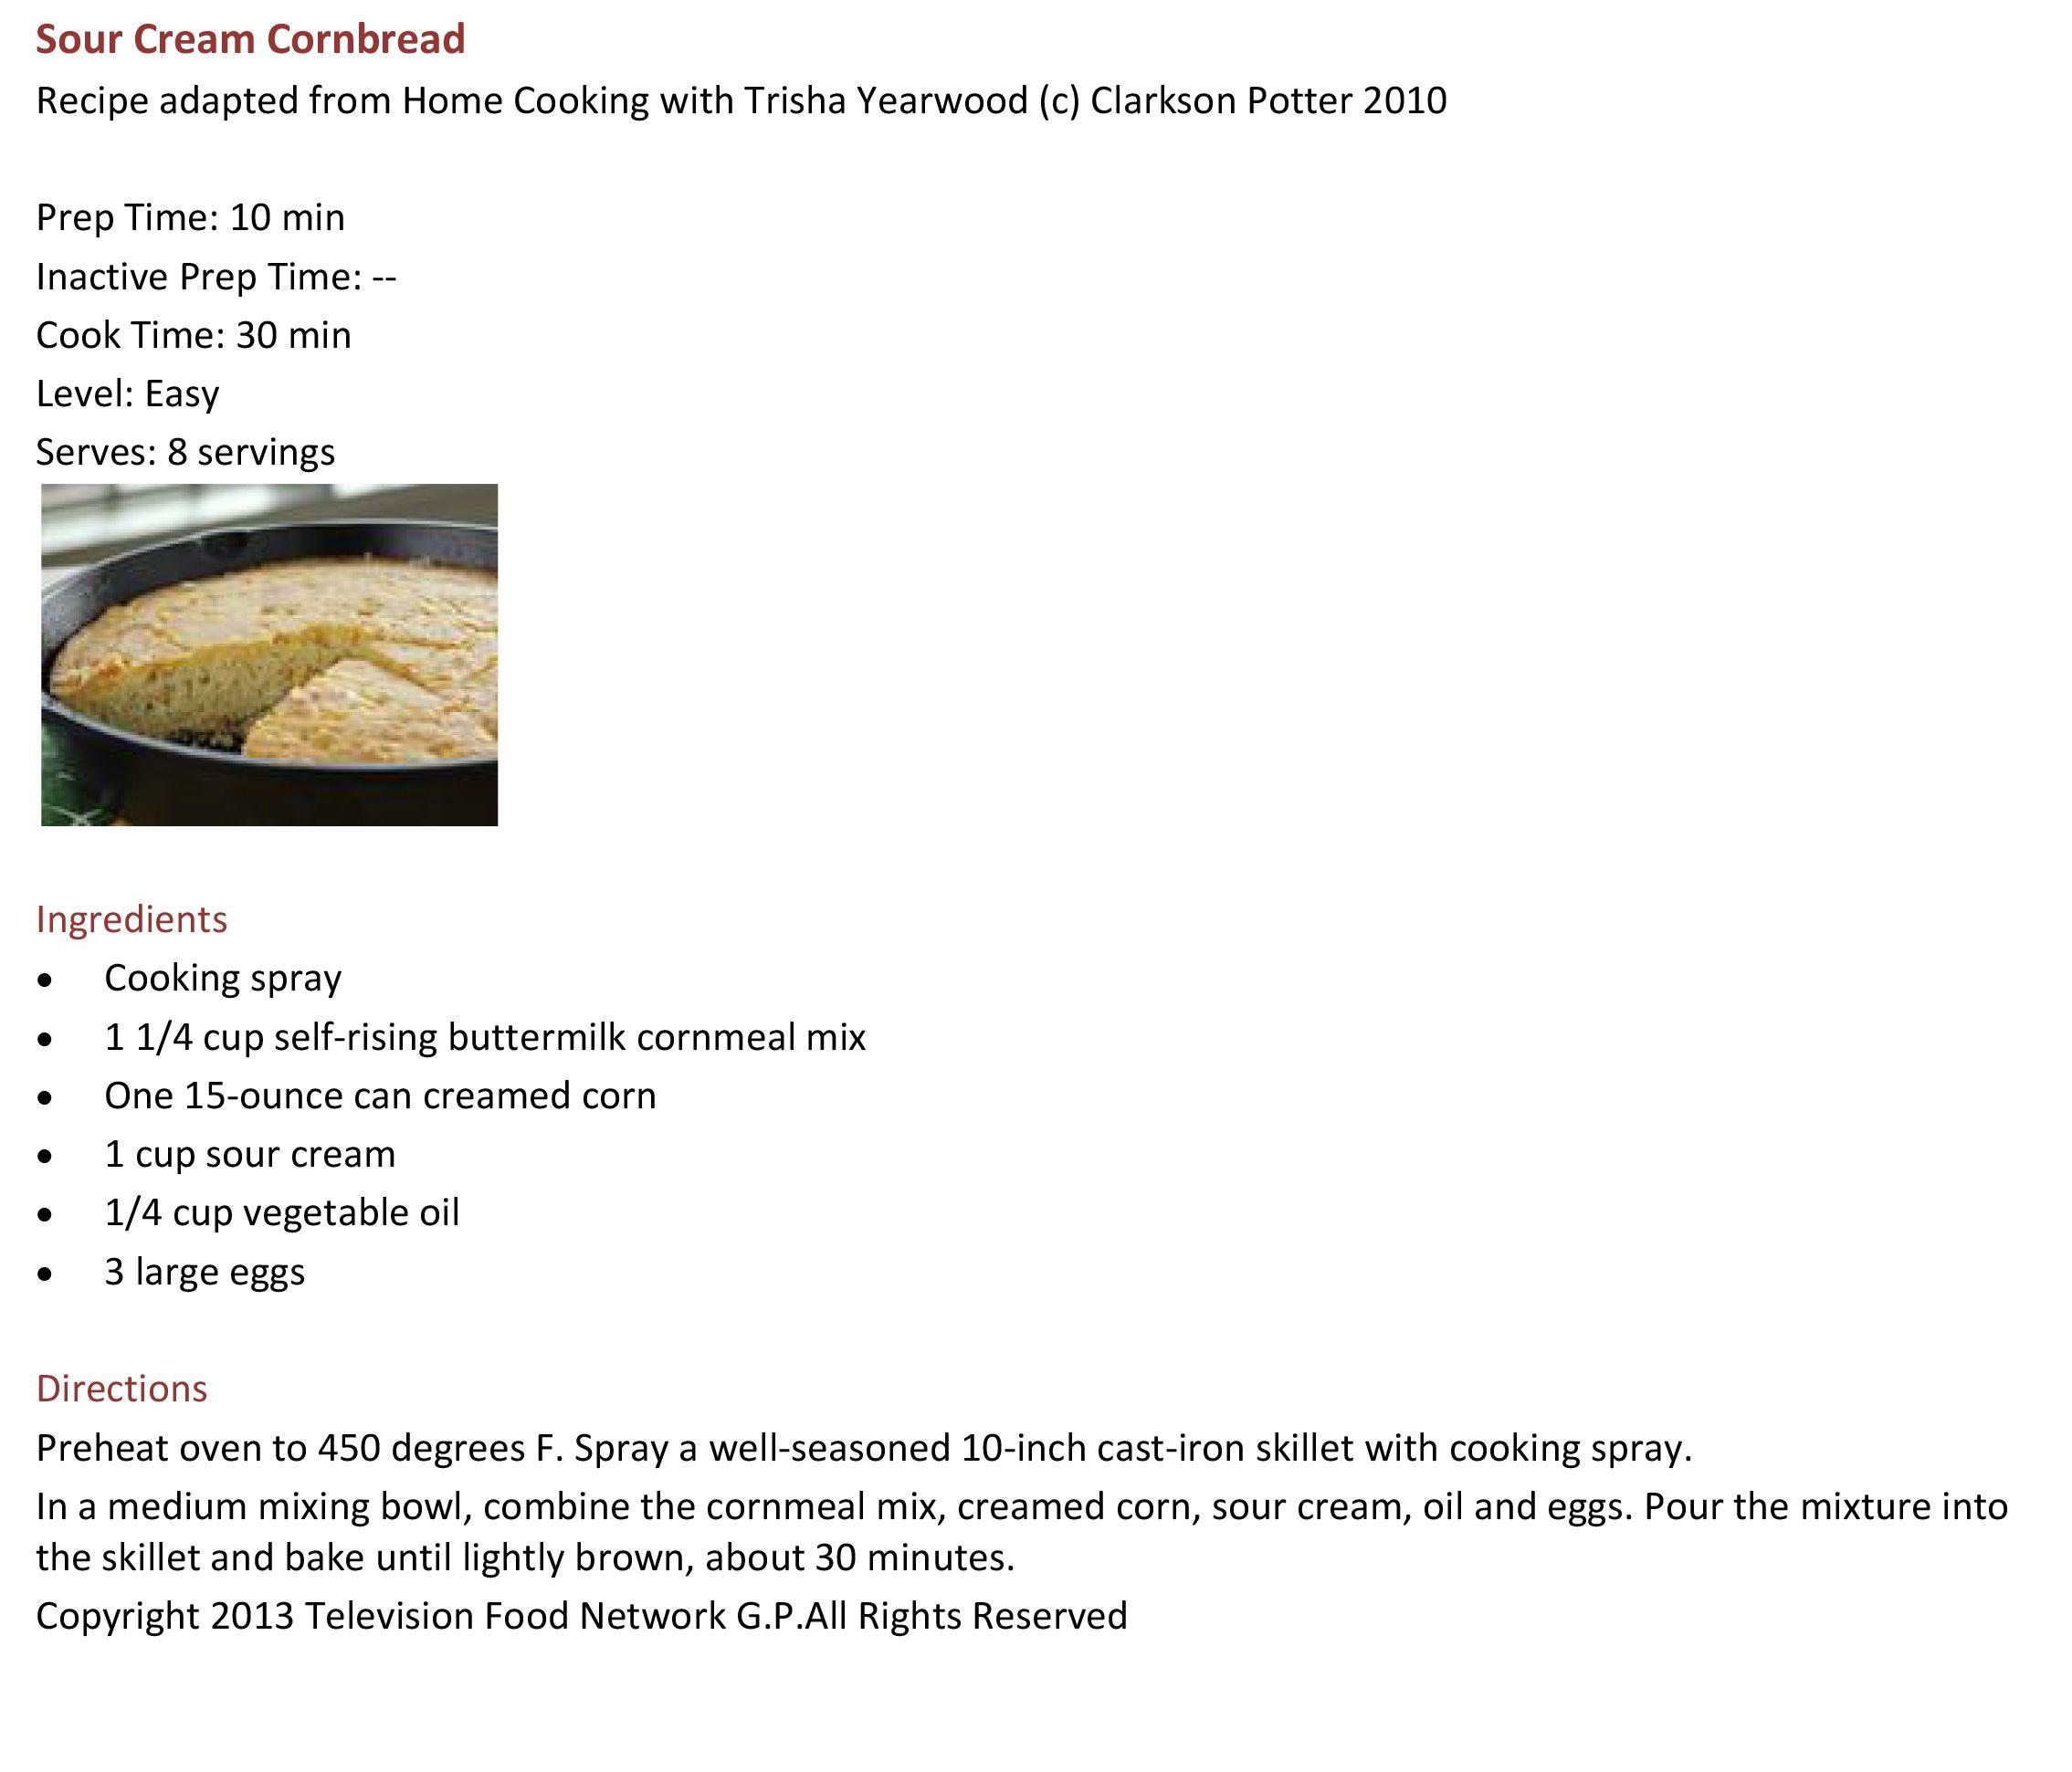 Trisha Yearwood S Sour Cream Cornbread Sour Cream Cornbread Corn Bread Recipe Cream Corn Bread